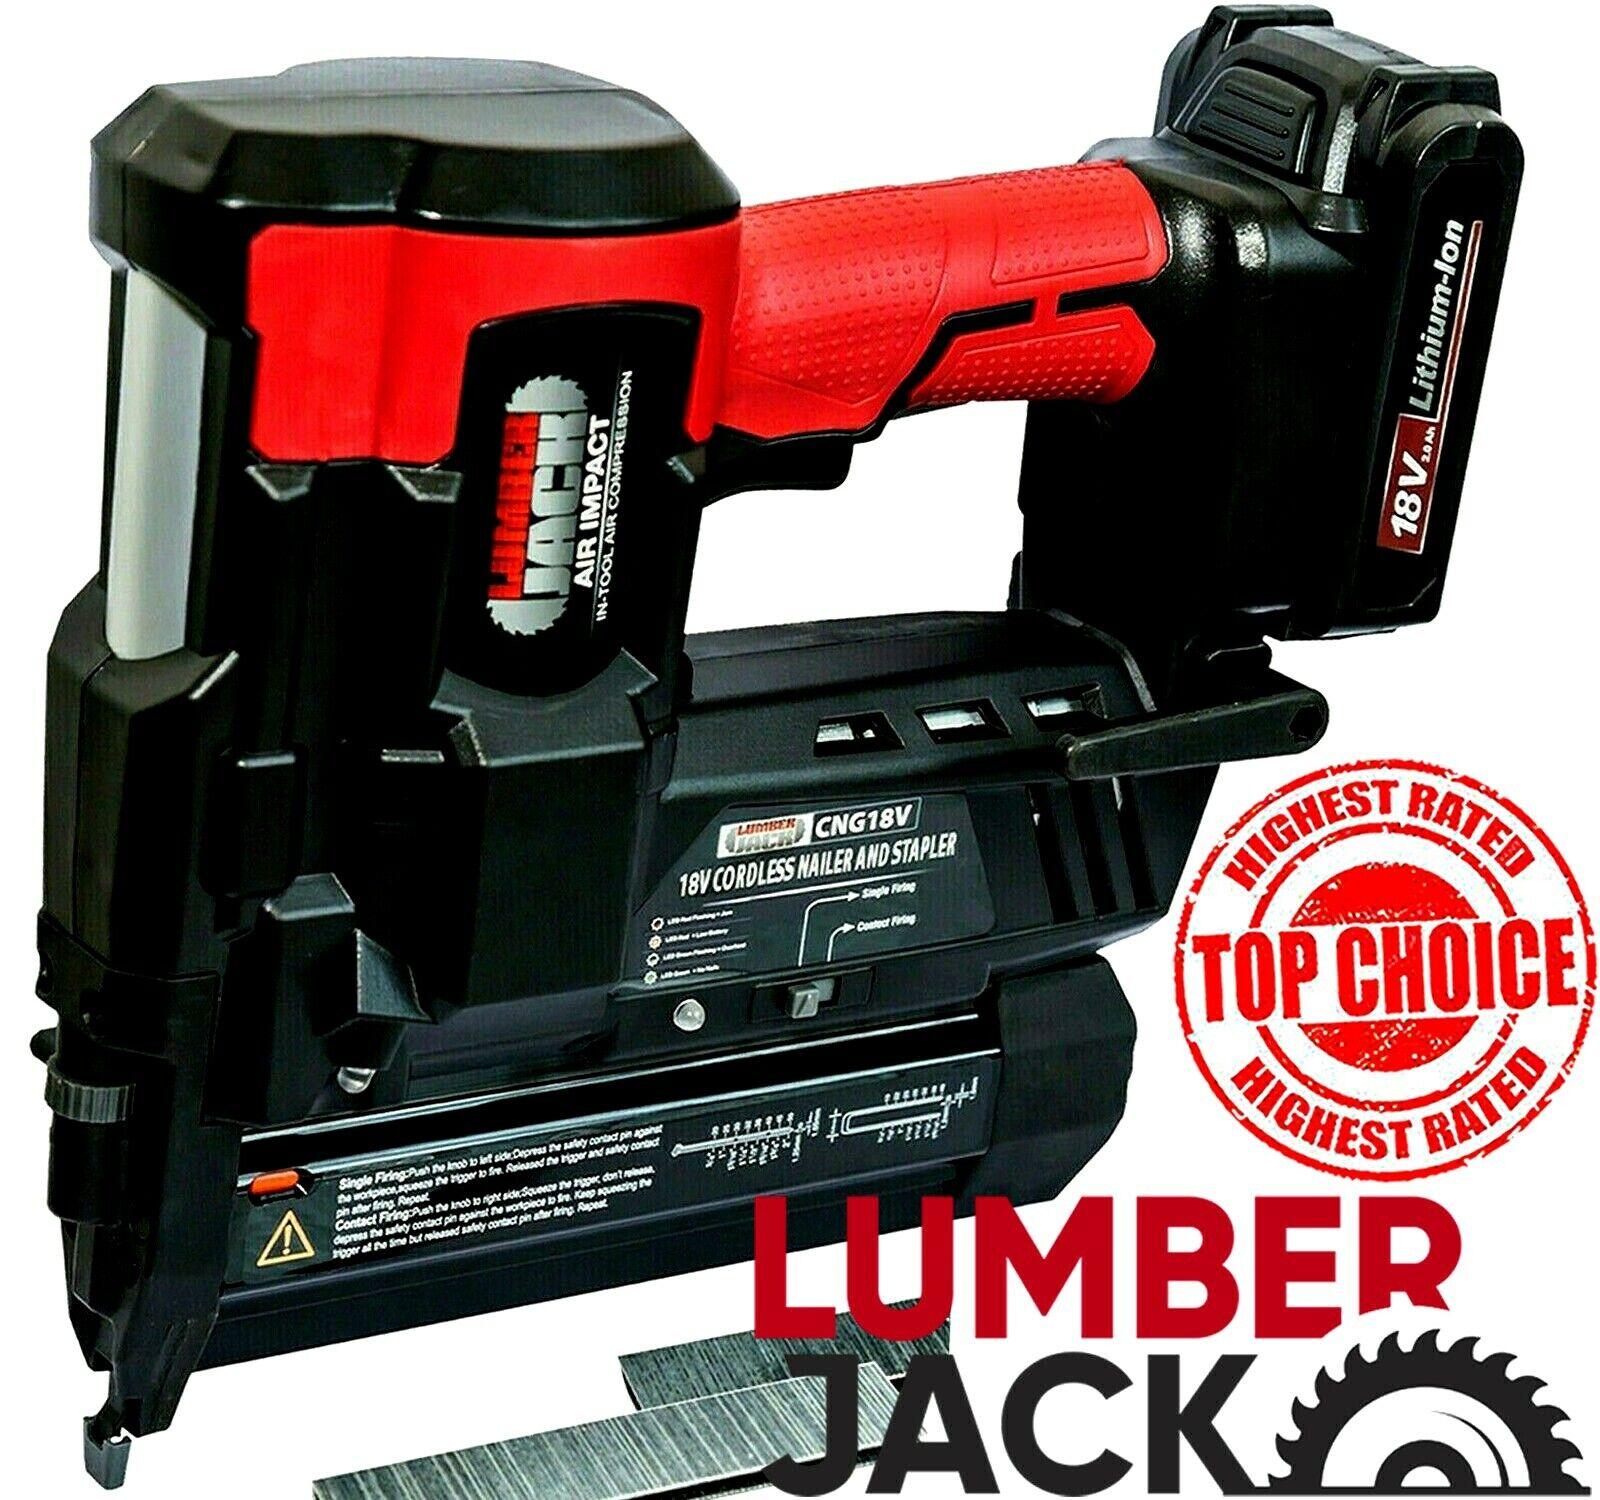 Lumberjack 18v Cordless Li-Ion Nail Gun & Stapler 2nd Fix Br